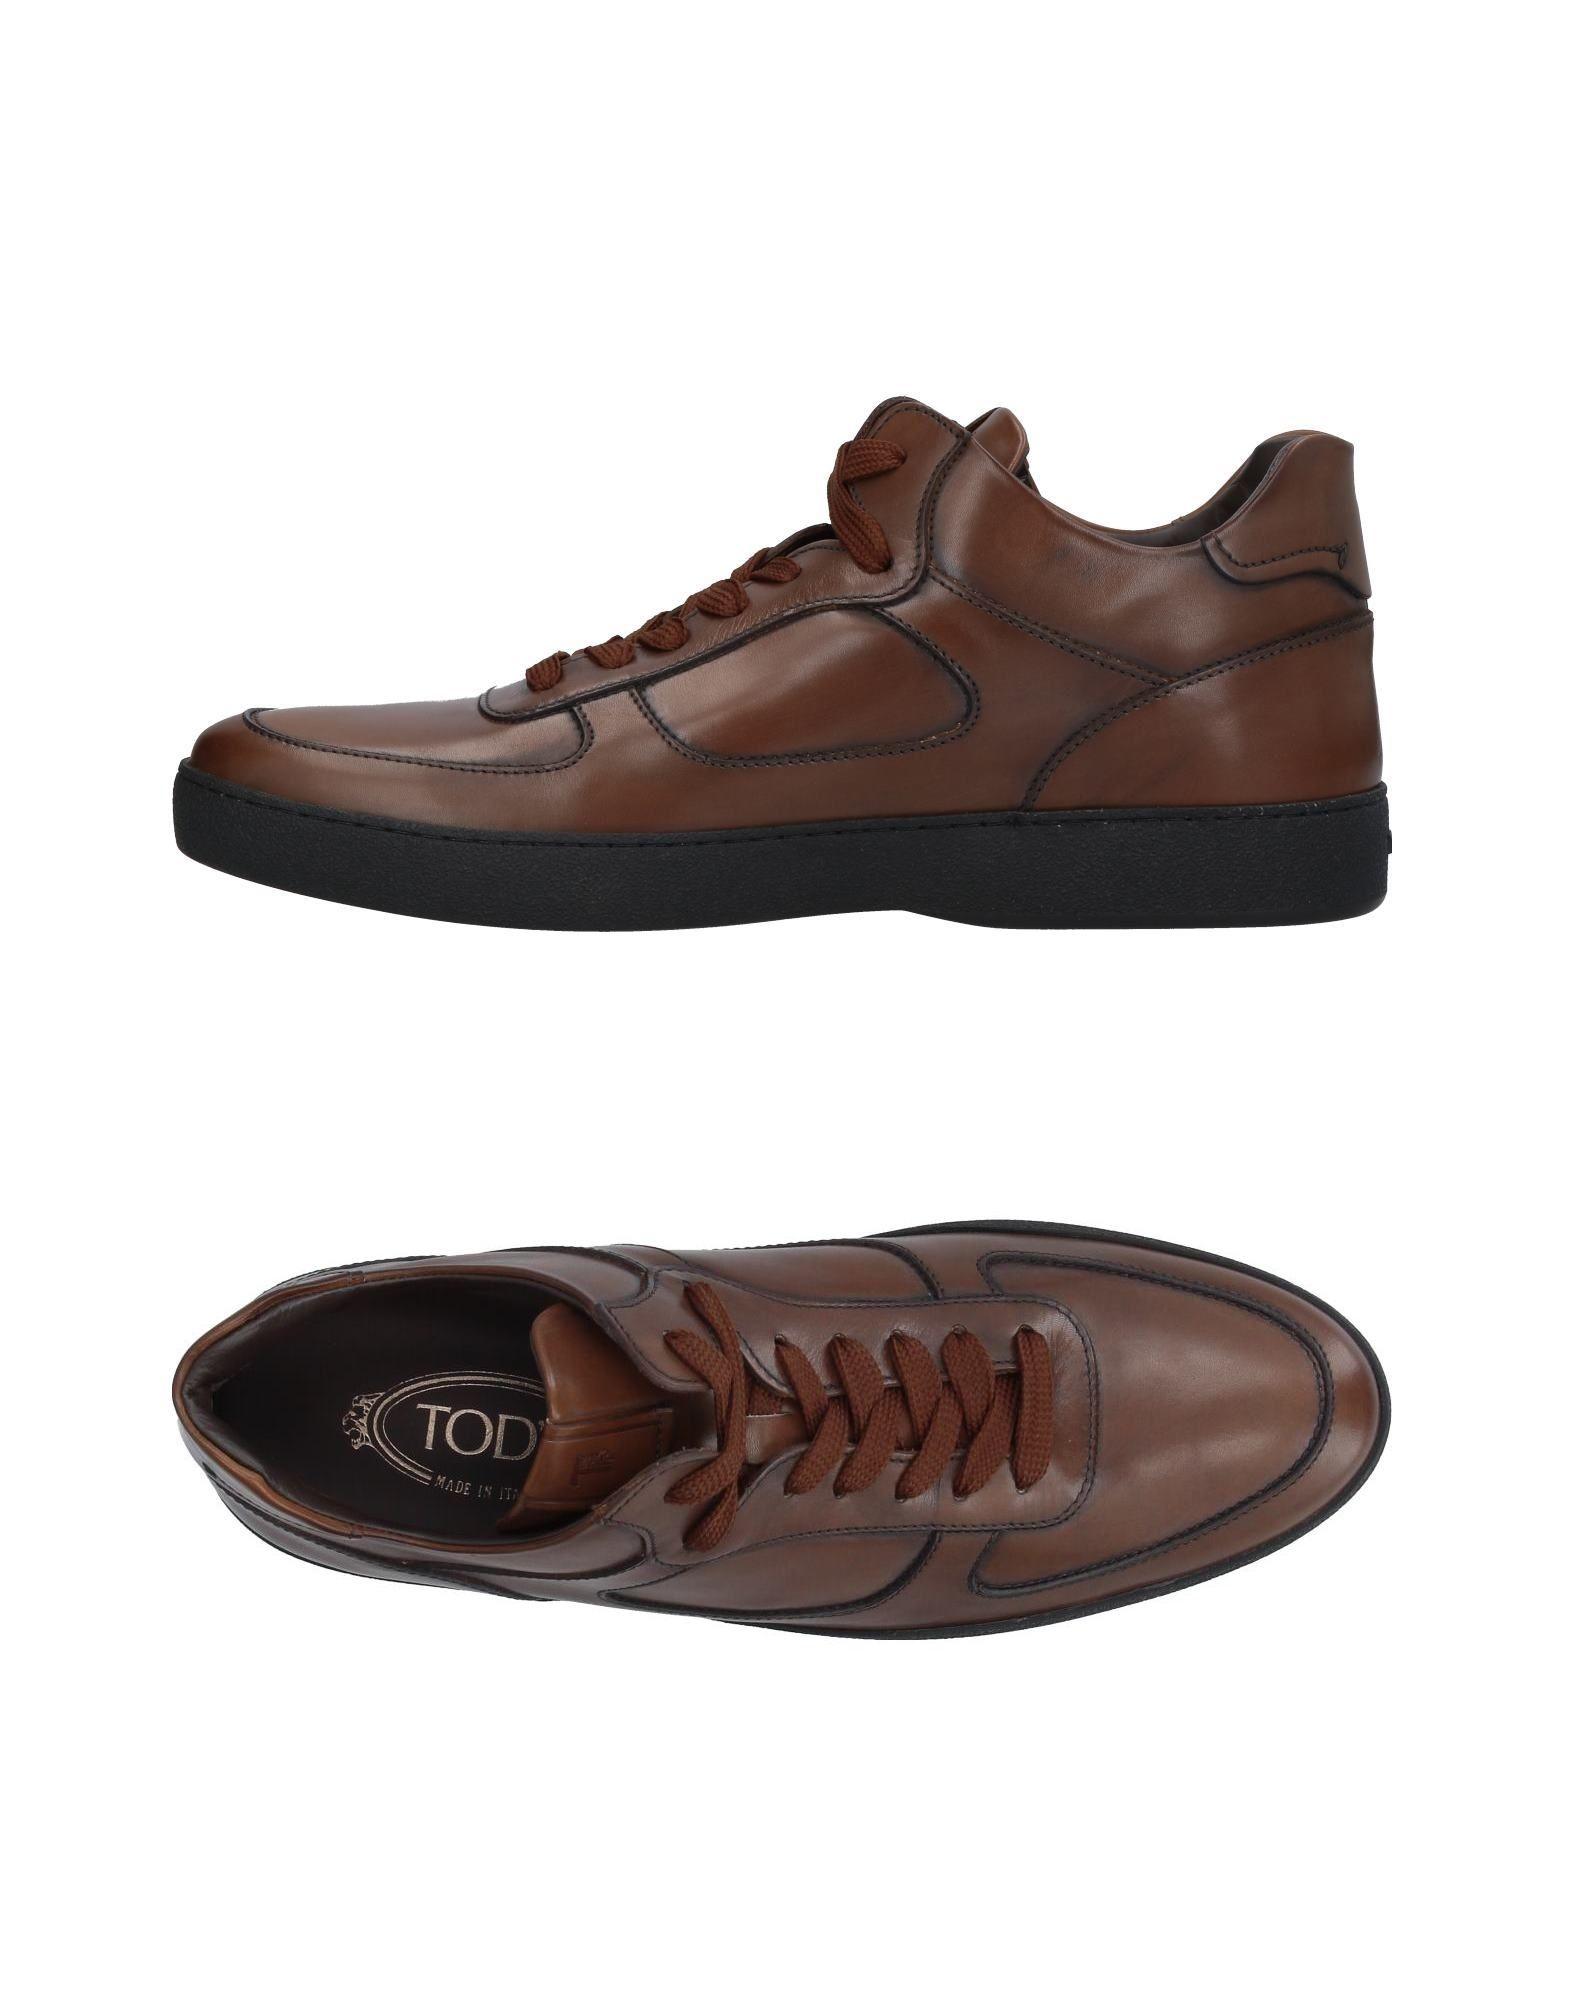 TOD'S Высокие кеды и кроссовки кеды кроссовки высокие dc council mid tx stone camo